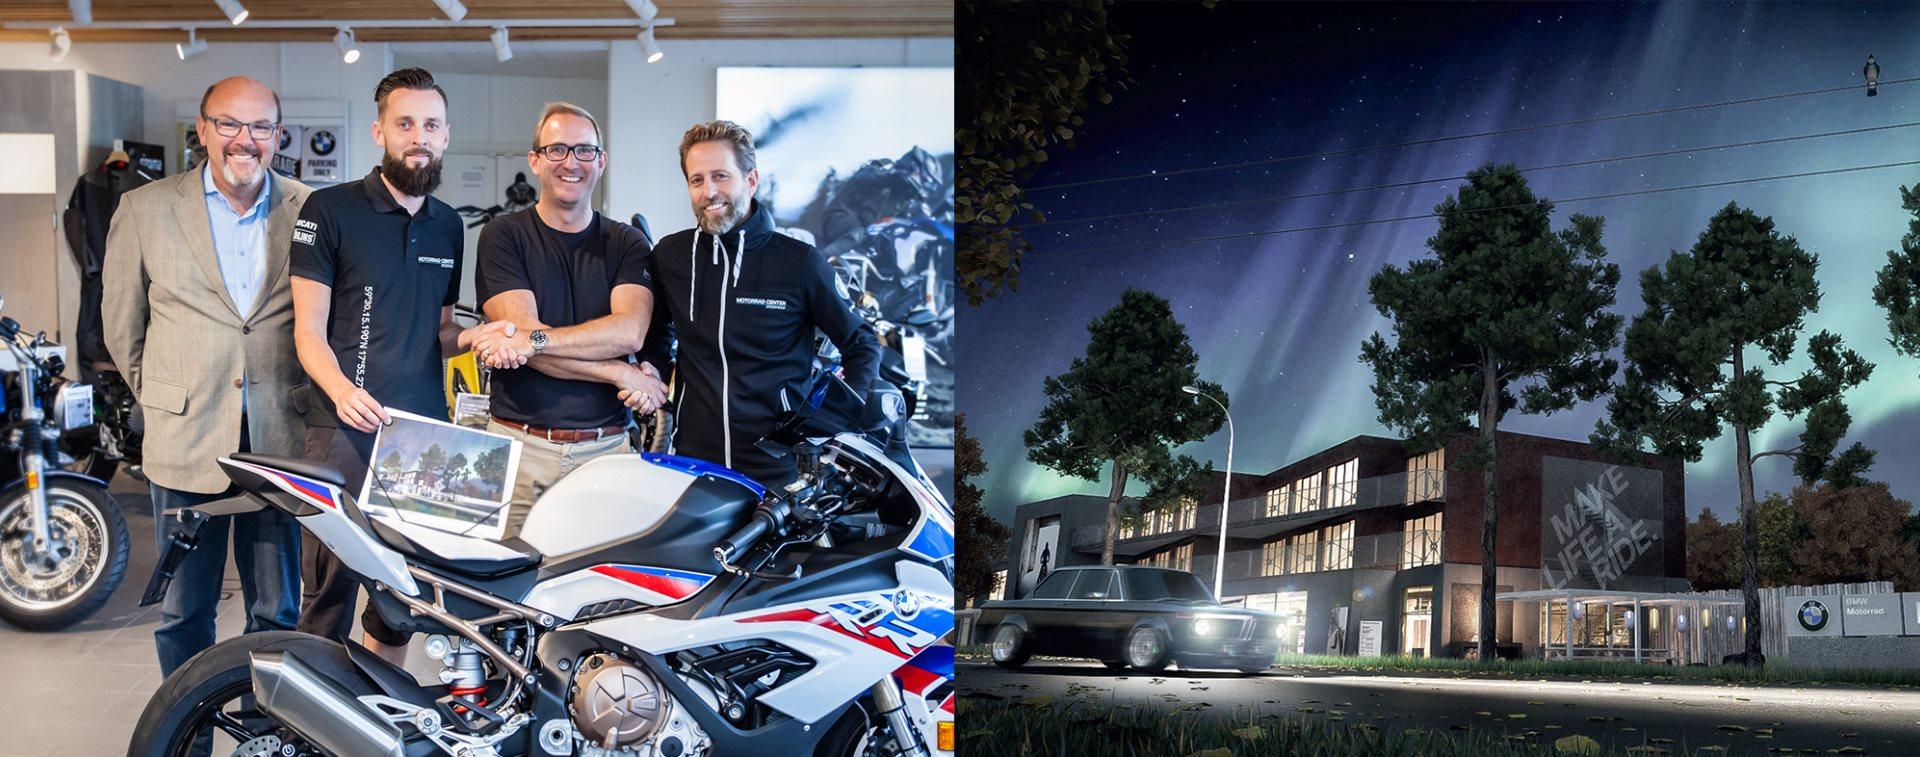 Motorrad Center Stockholm öppnar Flag Ship Store!